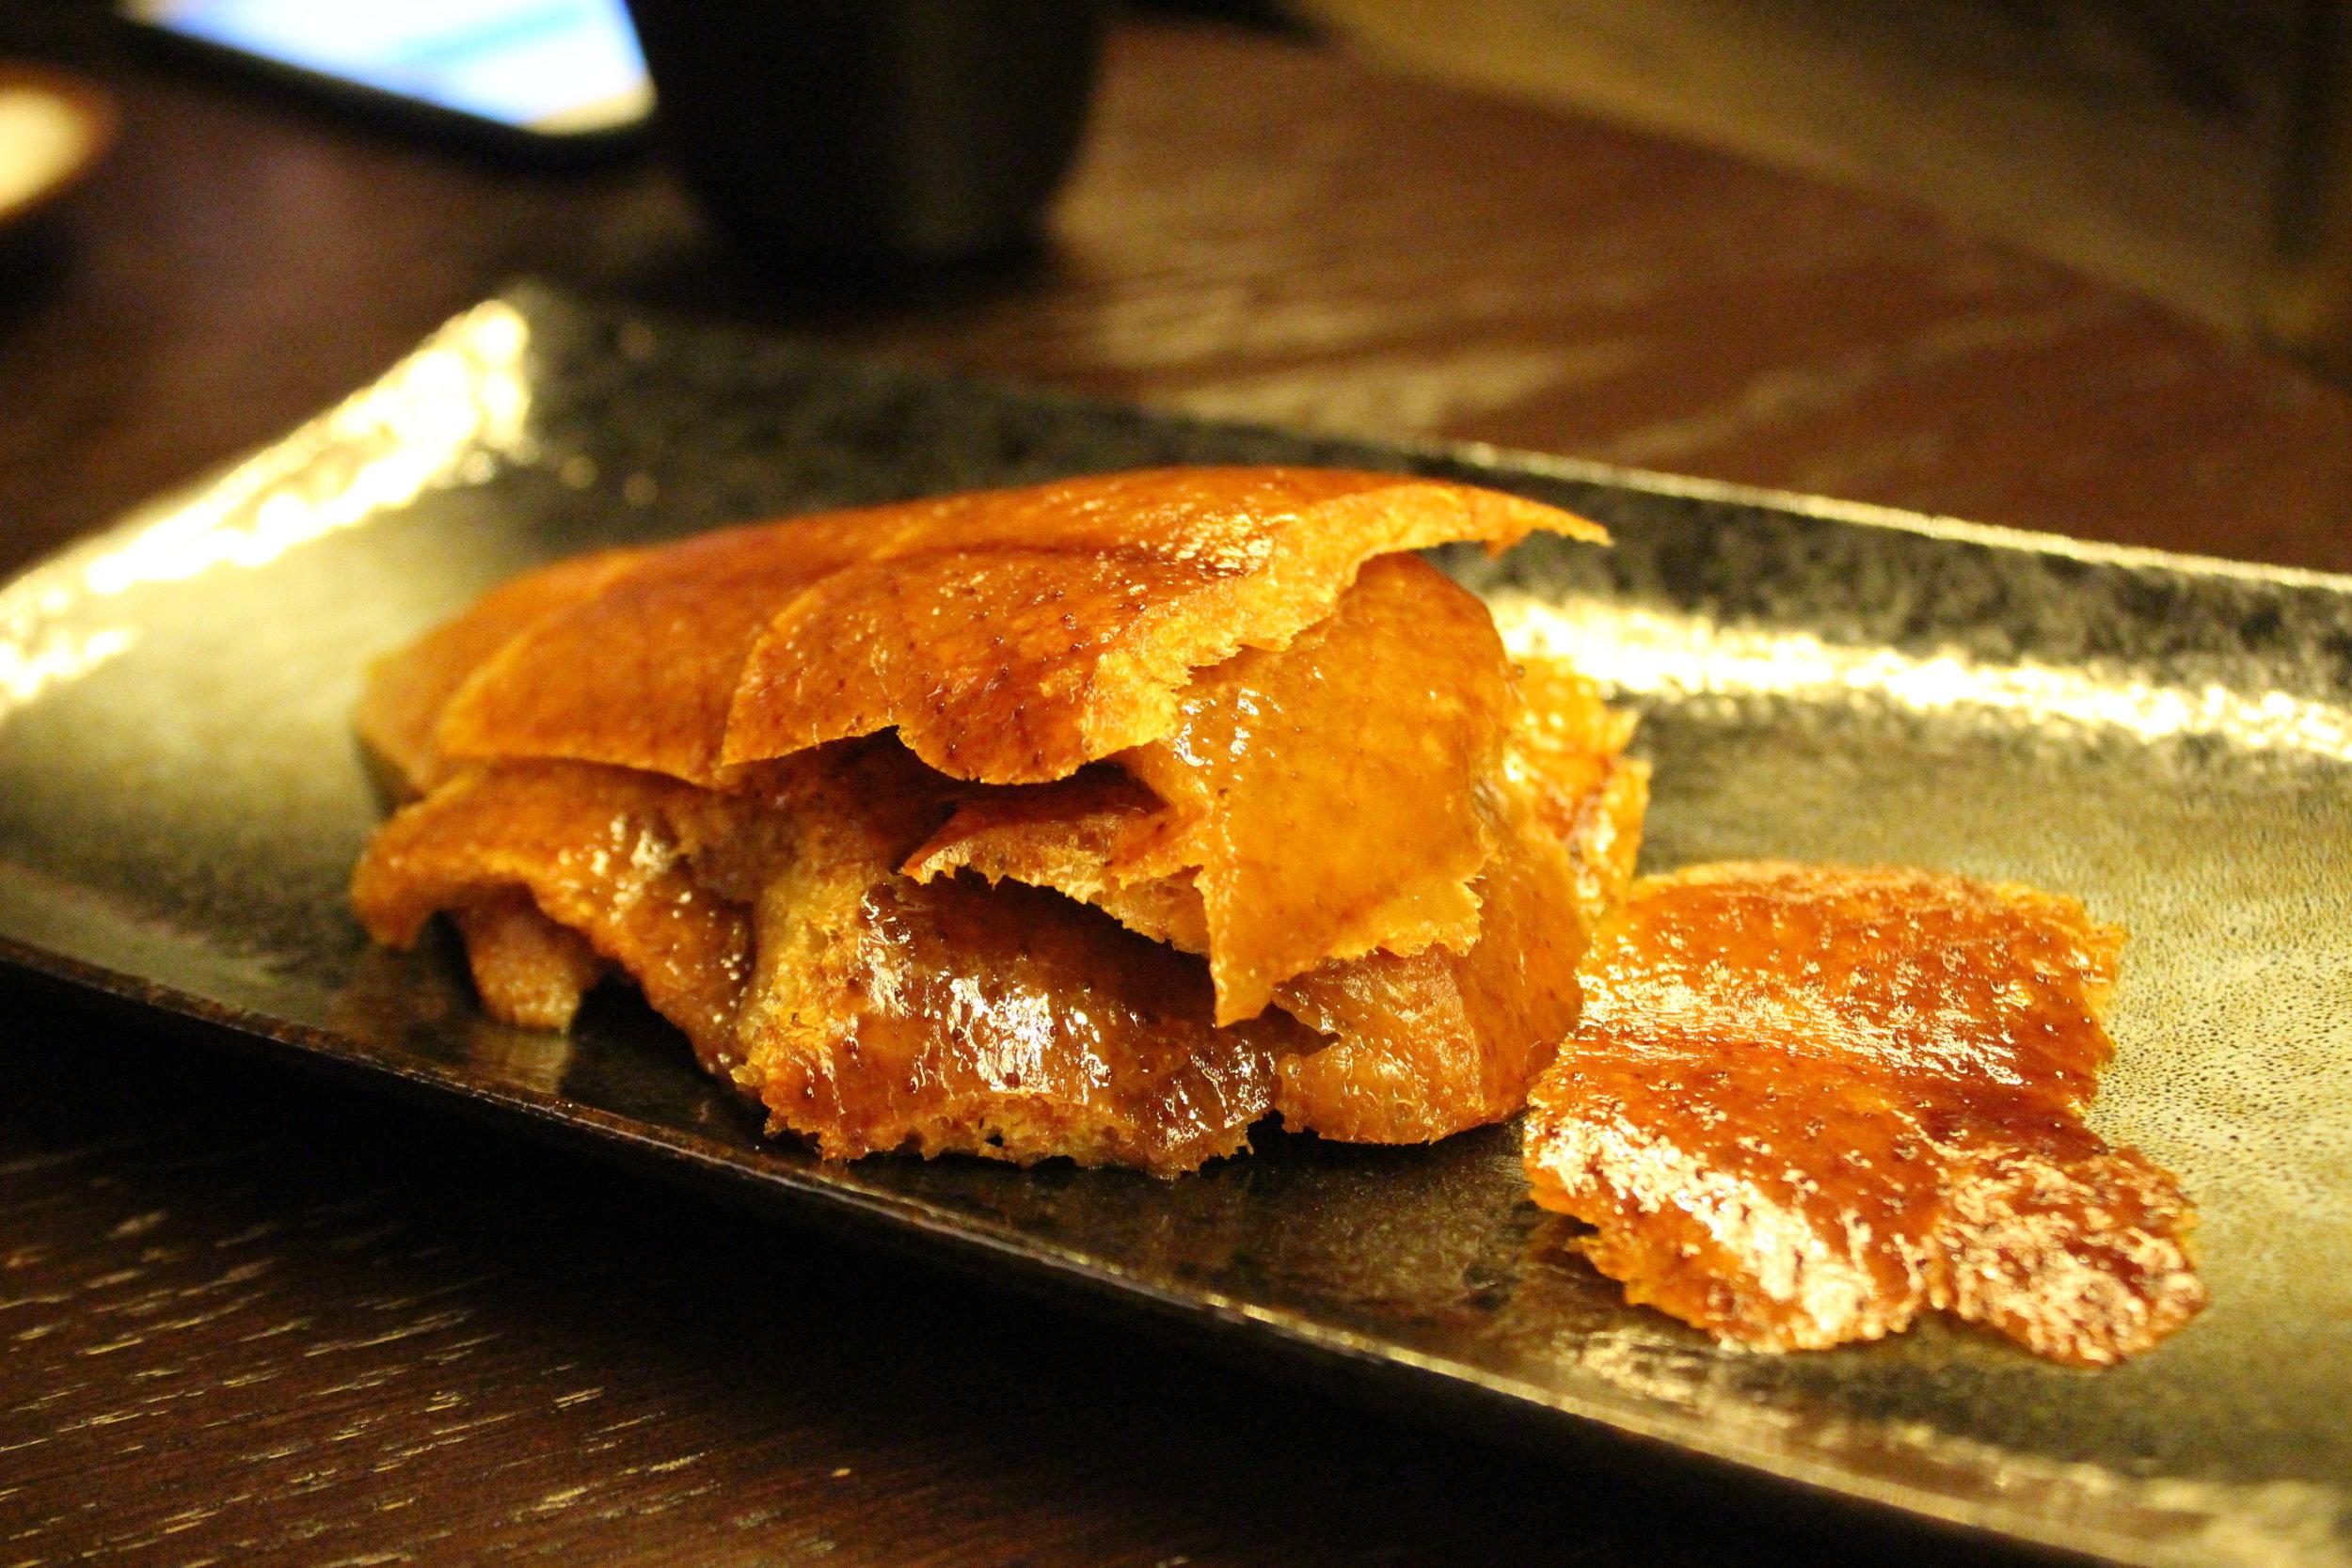 Apple Wood Roasted 42 Days Peking Duck at Mott 32 in Hong Kong